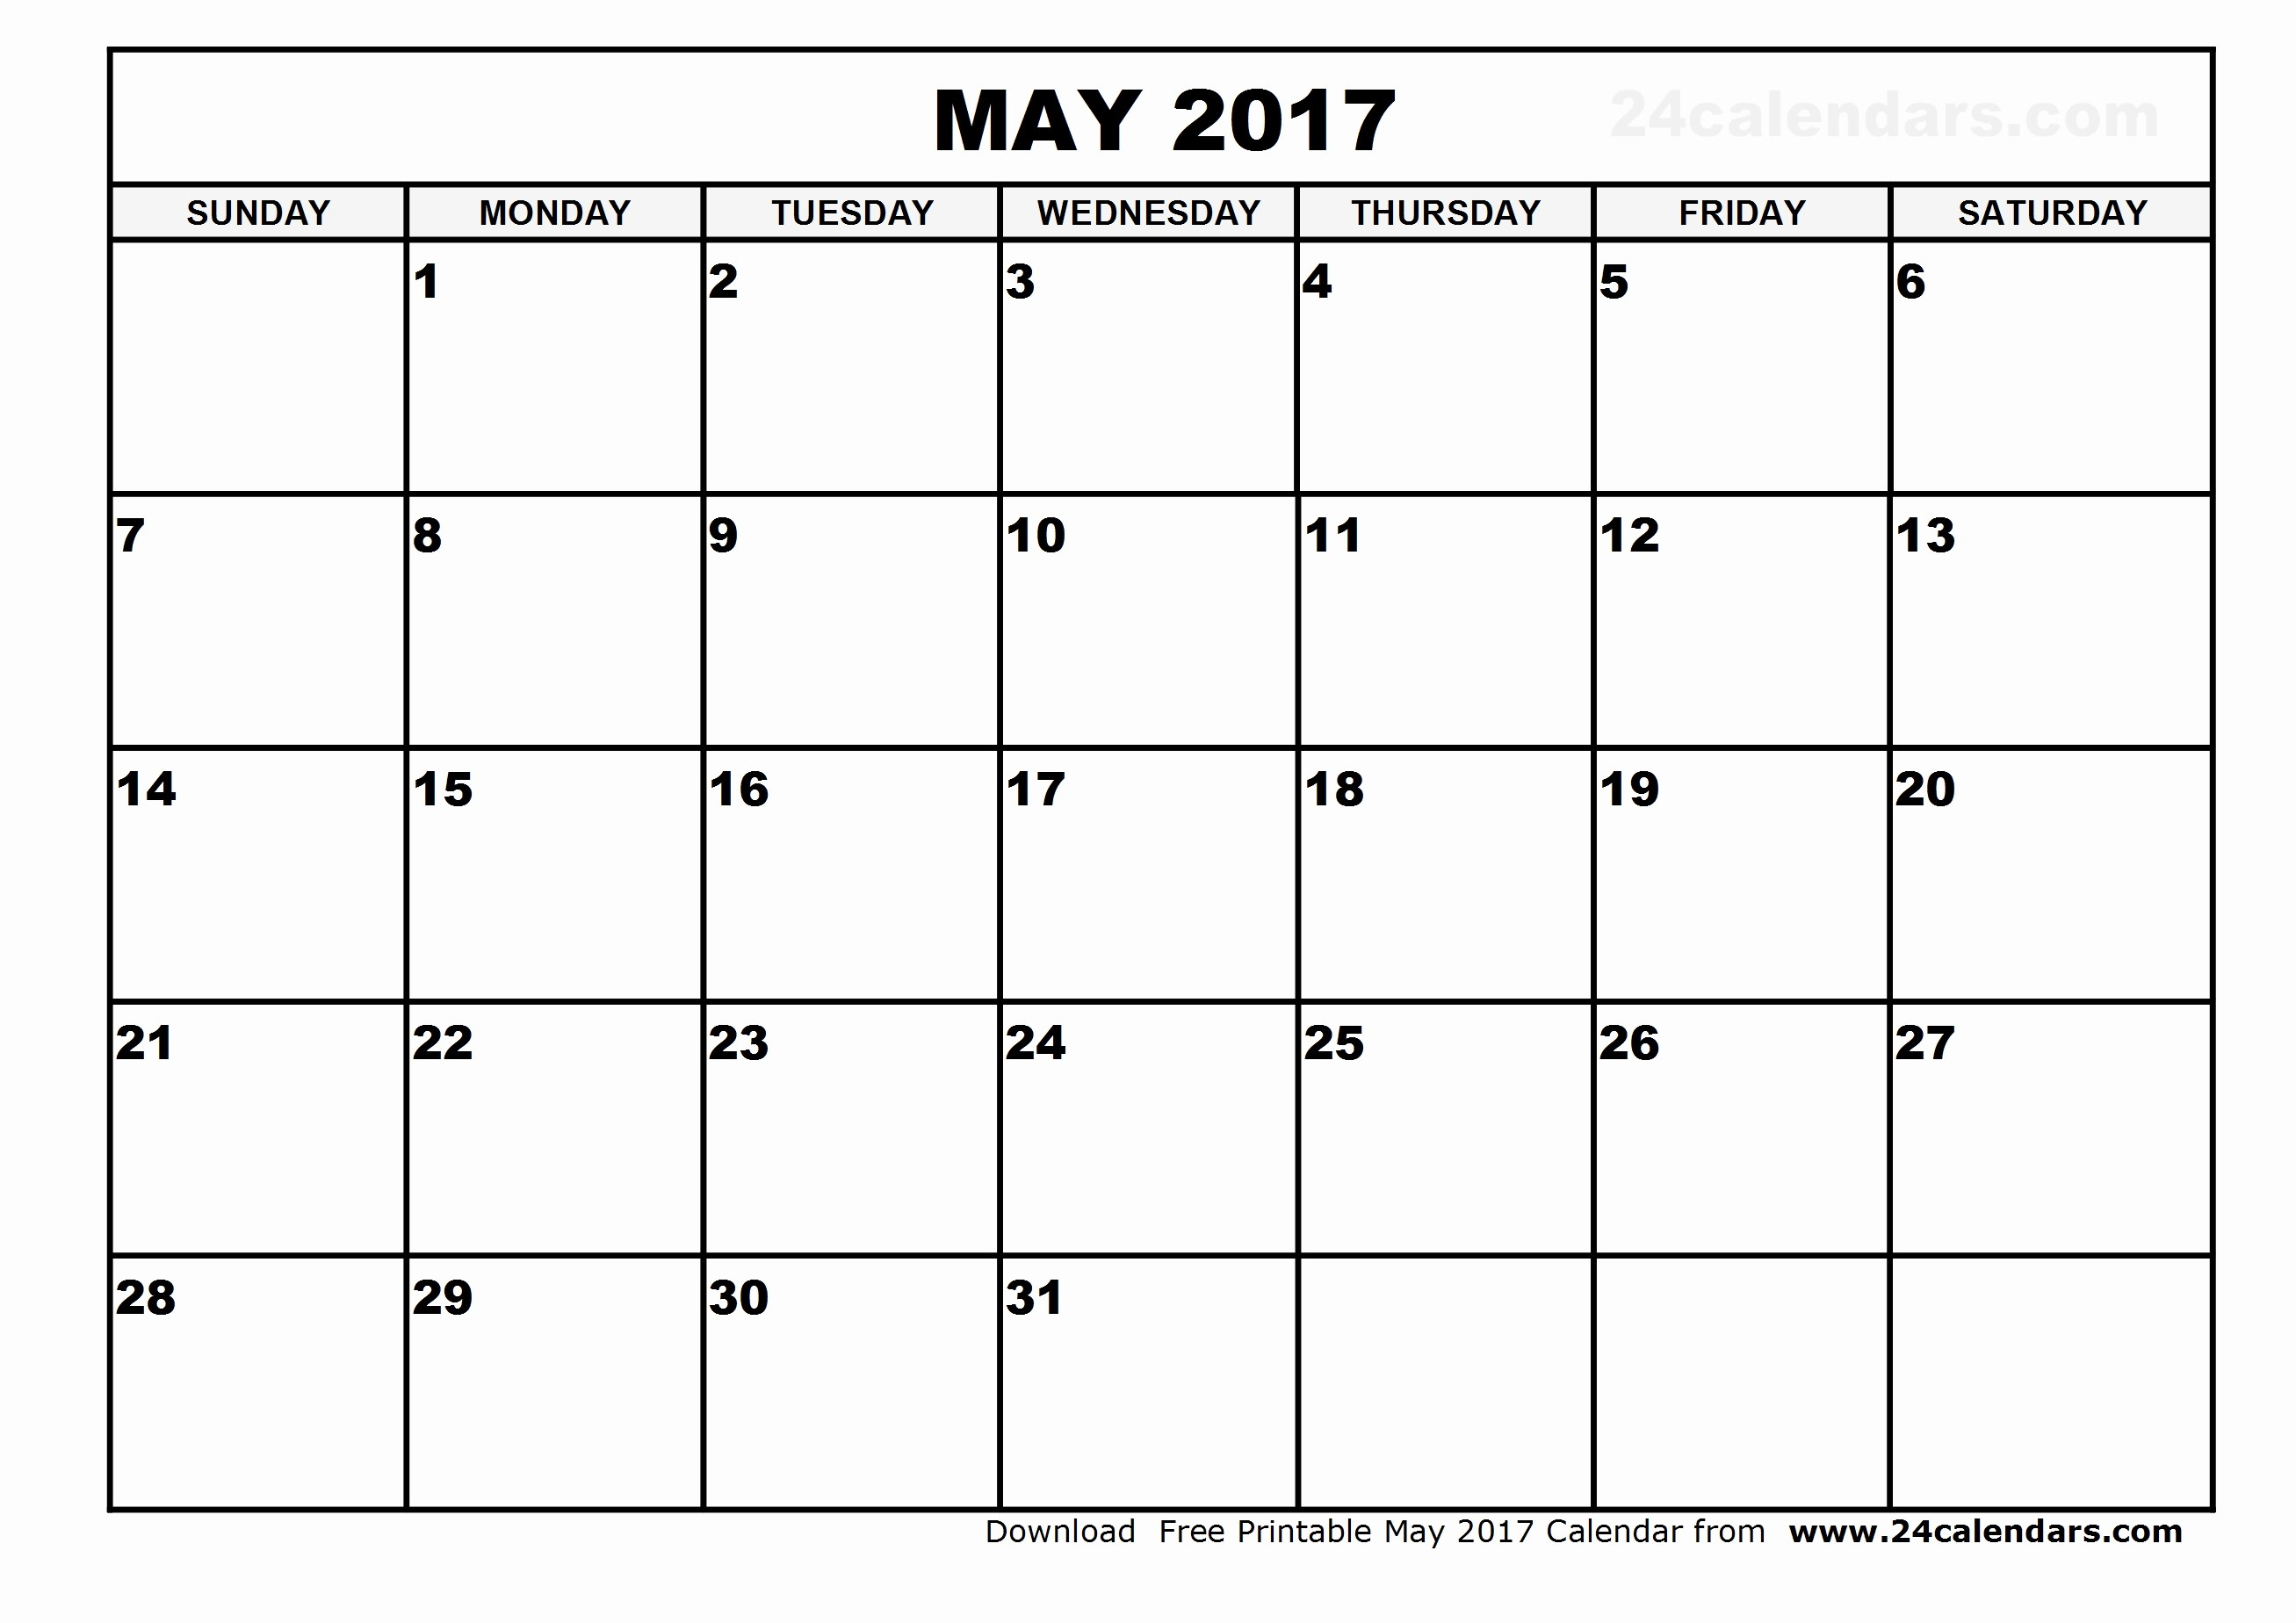 2017 Quarterly Calendar Template Excel Best Of May 2017 Calendar Excel